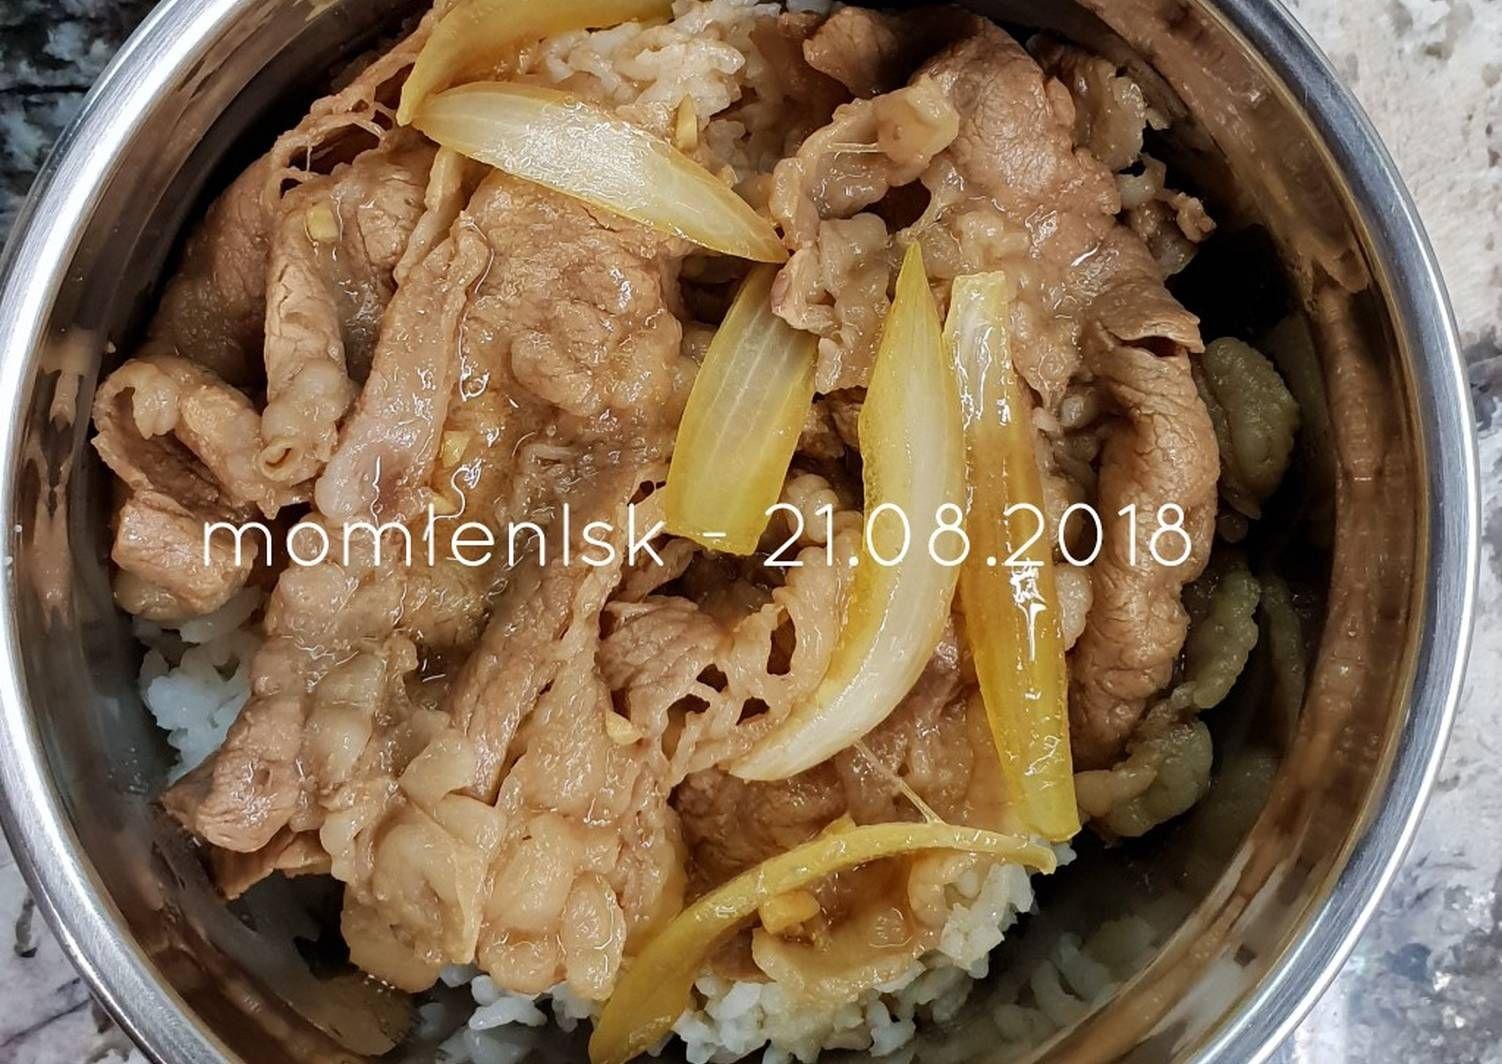 Resep Gyudon Yoshinoya An Oleh Momlenlsk Resep Daging Resep Daging Sapi